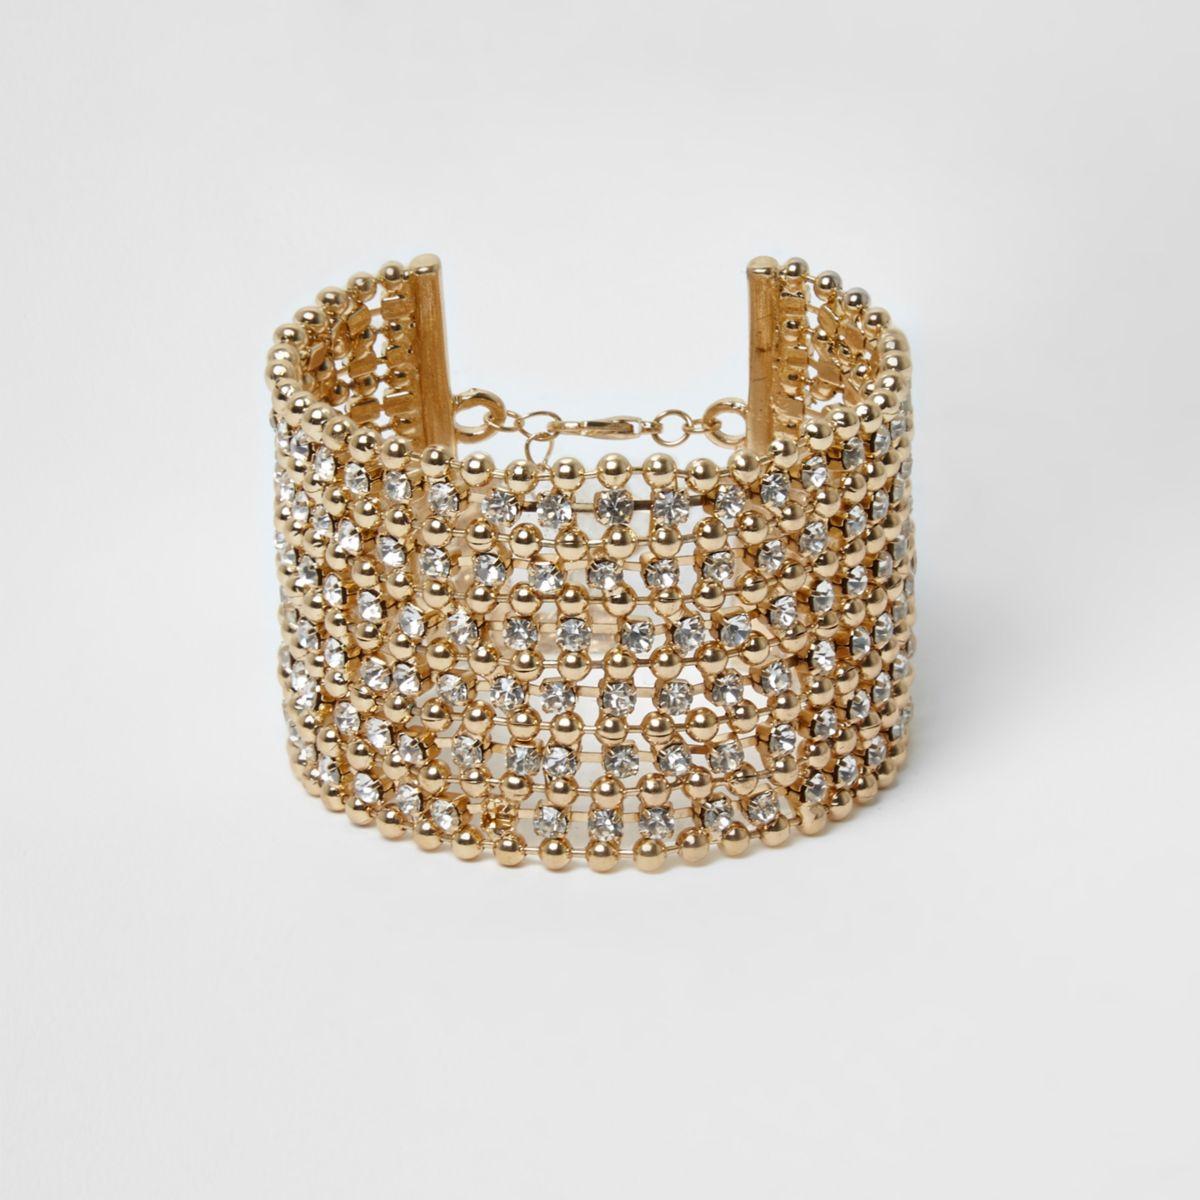 Gold tone bead and diamante cuff bracelet